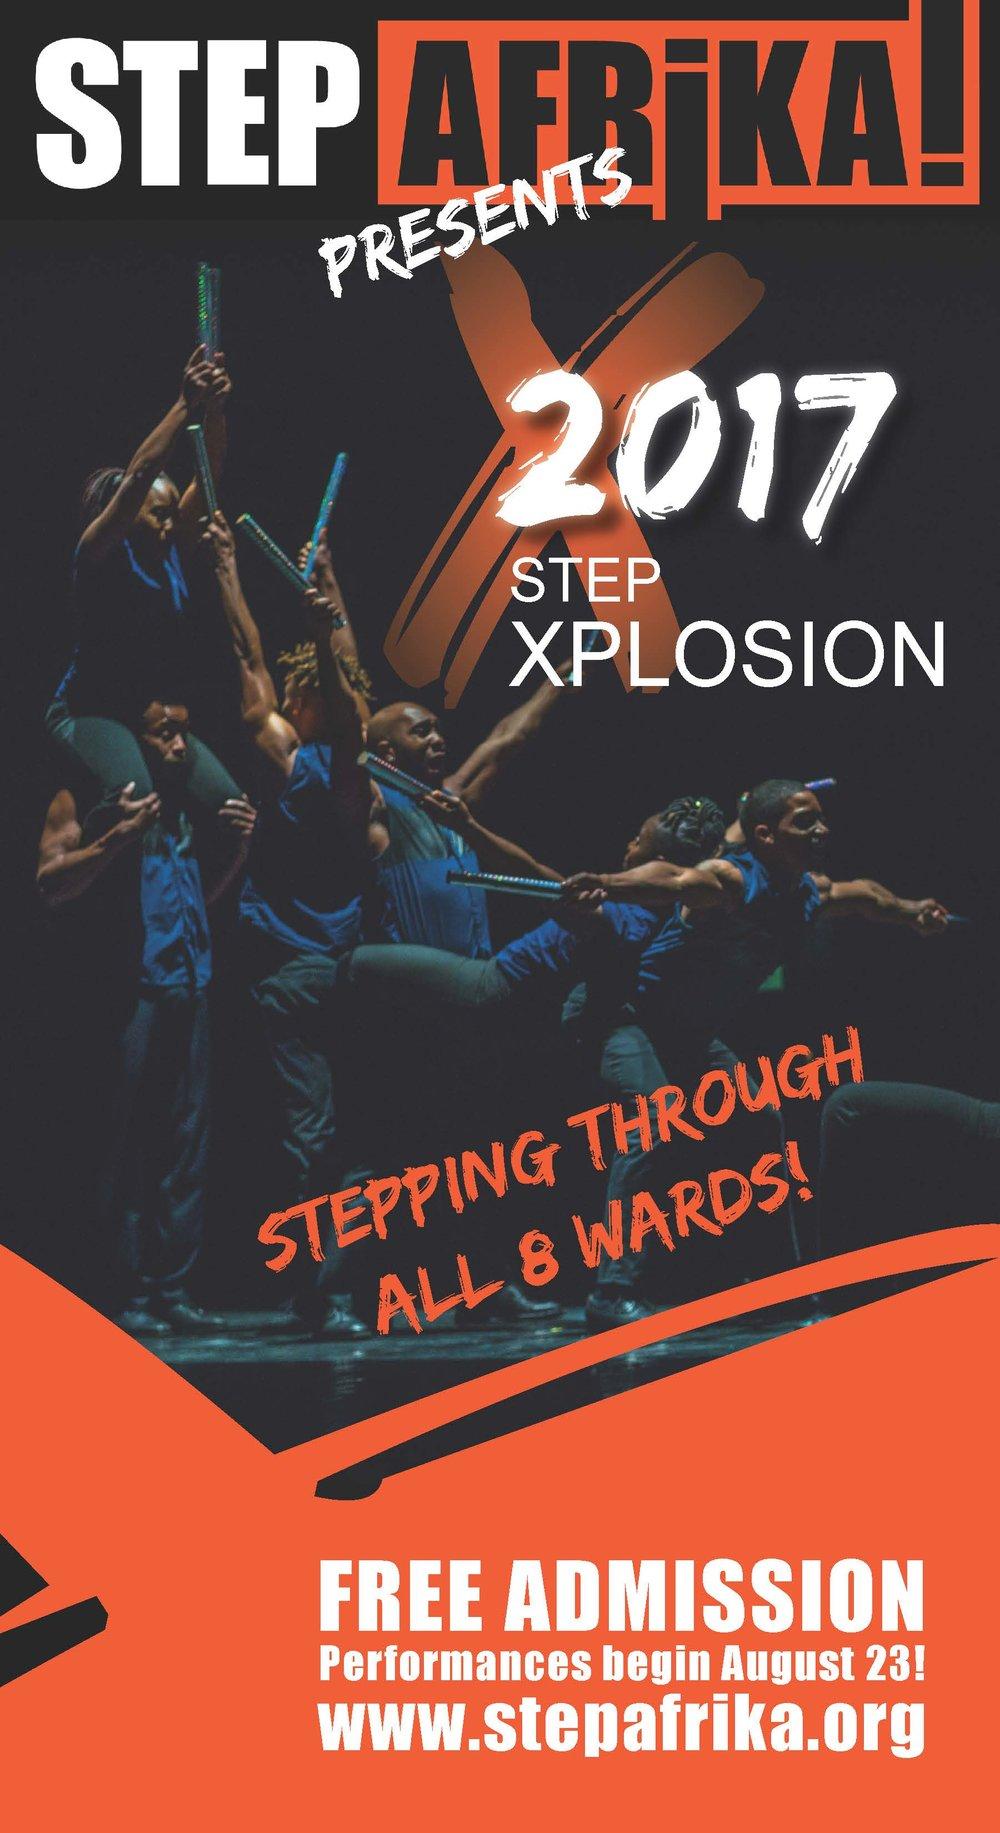 StepAfrikaXplosion_2017 Postcard_FINAL_Page_1.jpg